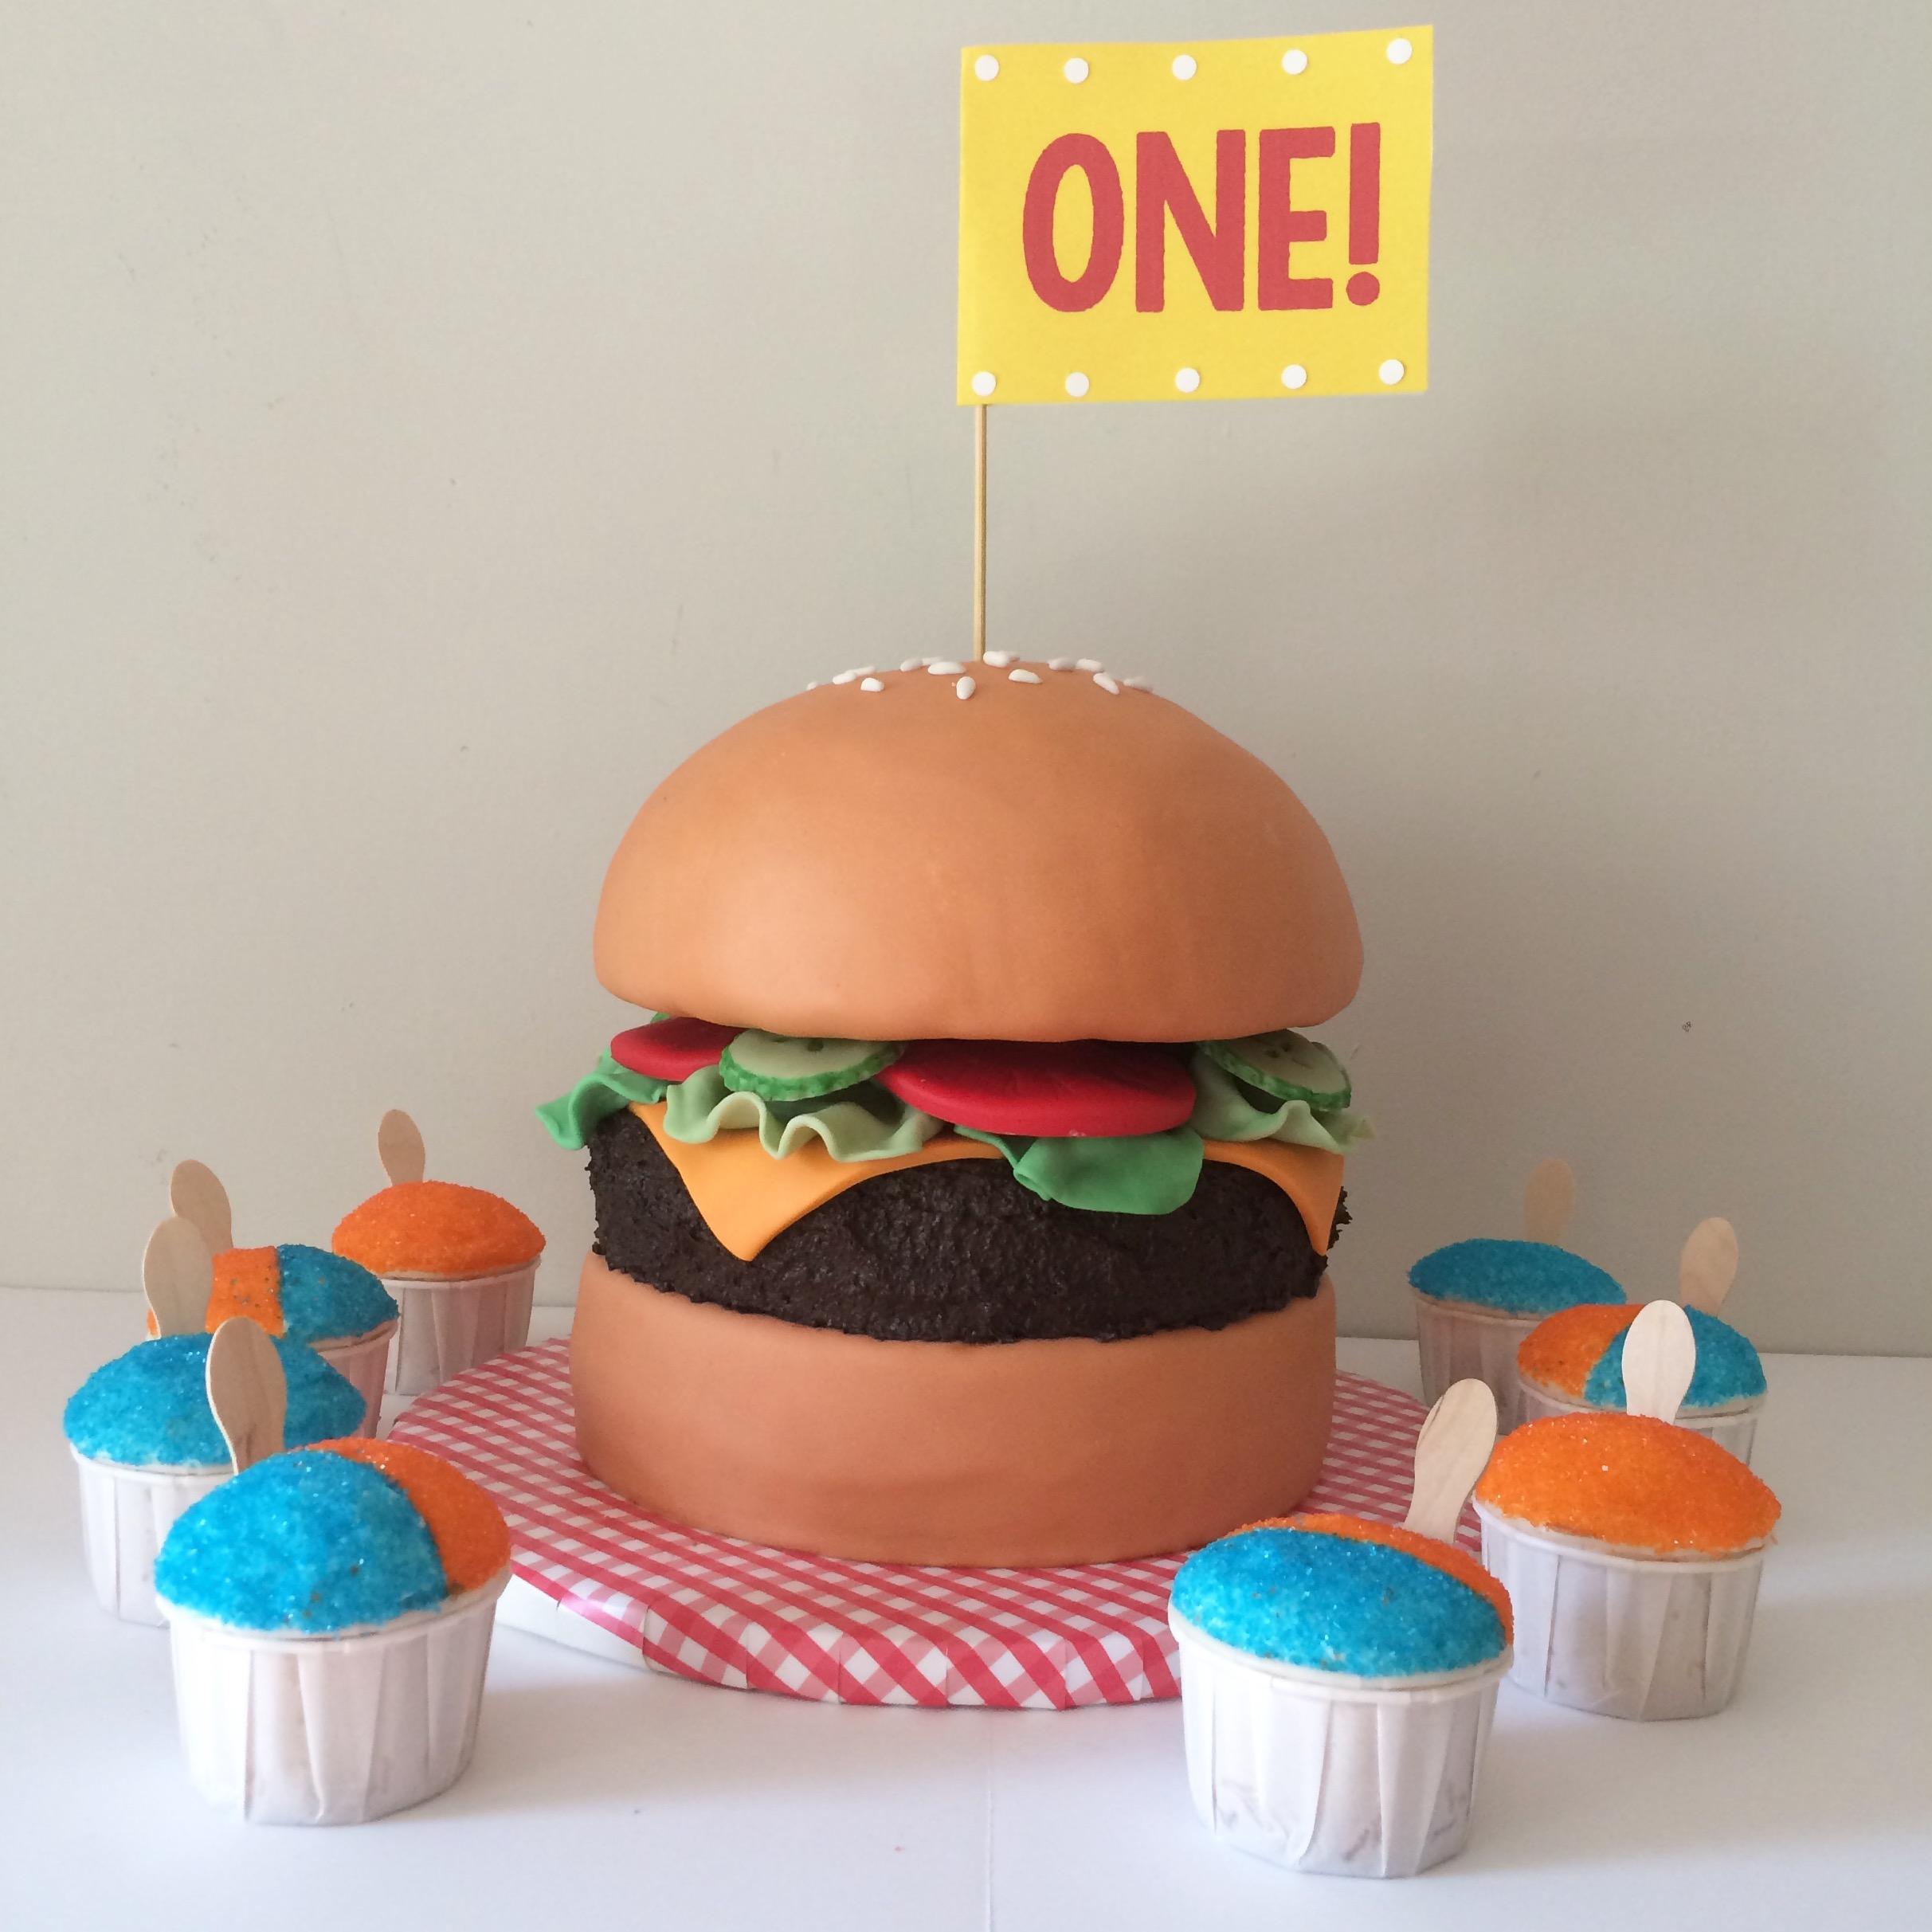 snocone cupcakes and hamburger cake